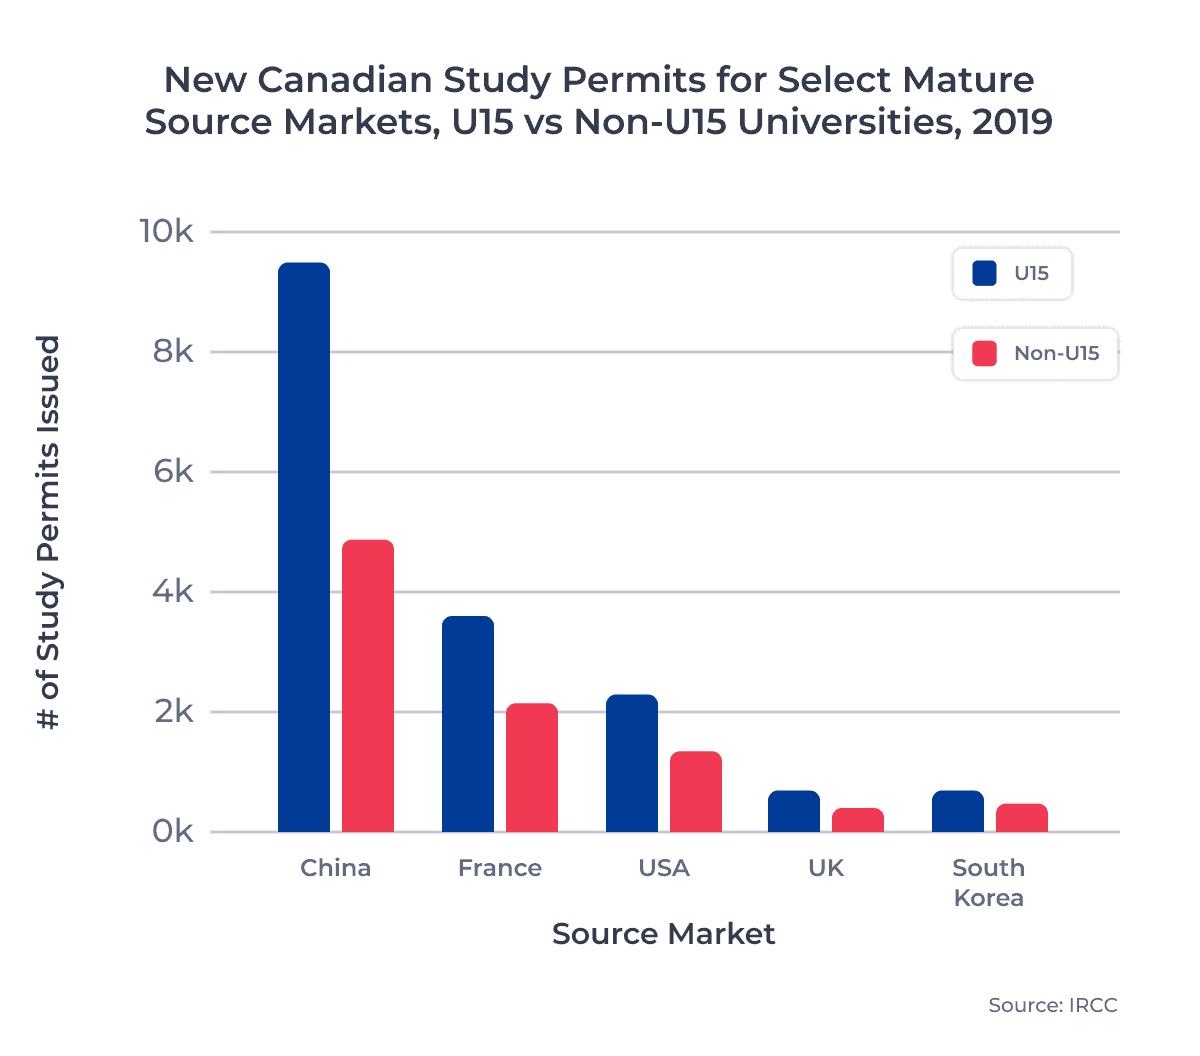 New Canadian Study Permits for Select Mature Source Markets, U15 vs Non-U15 Universities, 2019